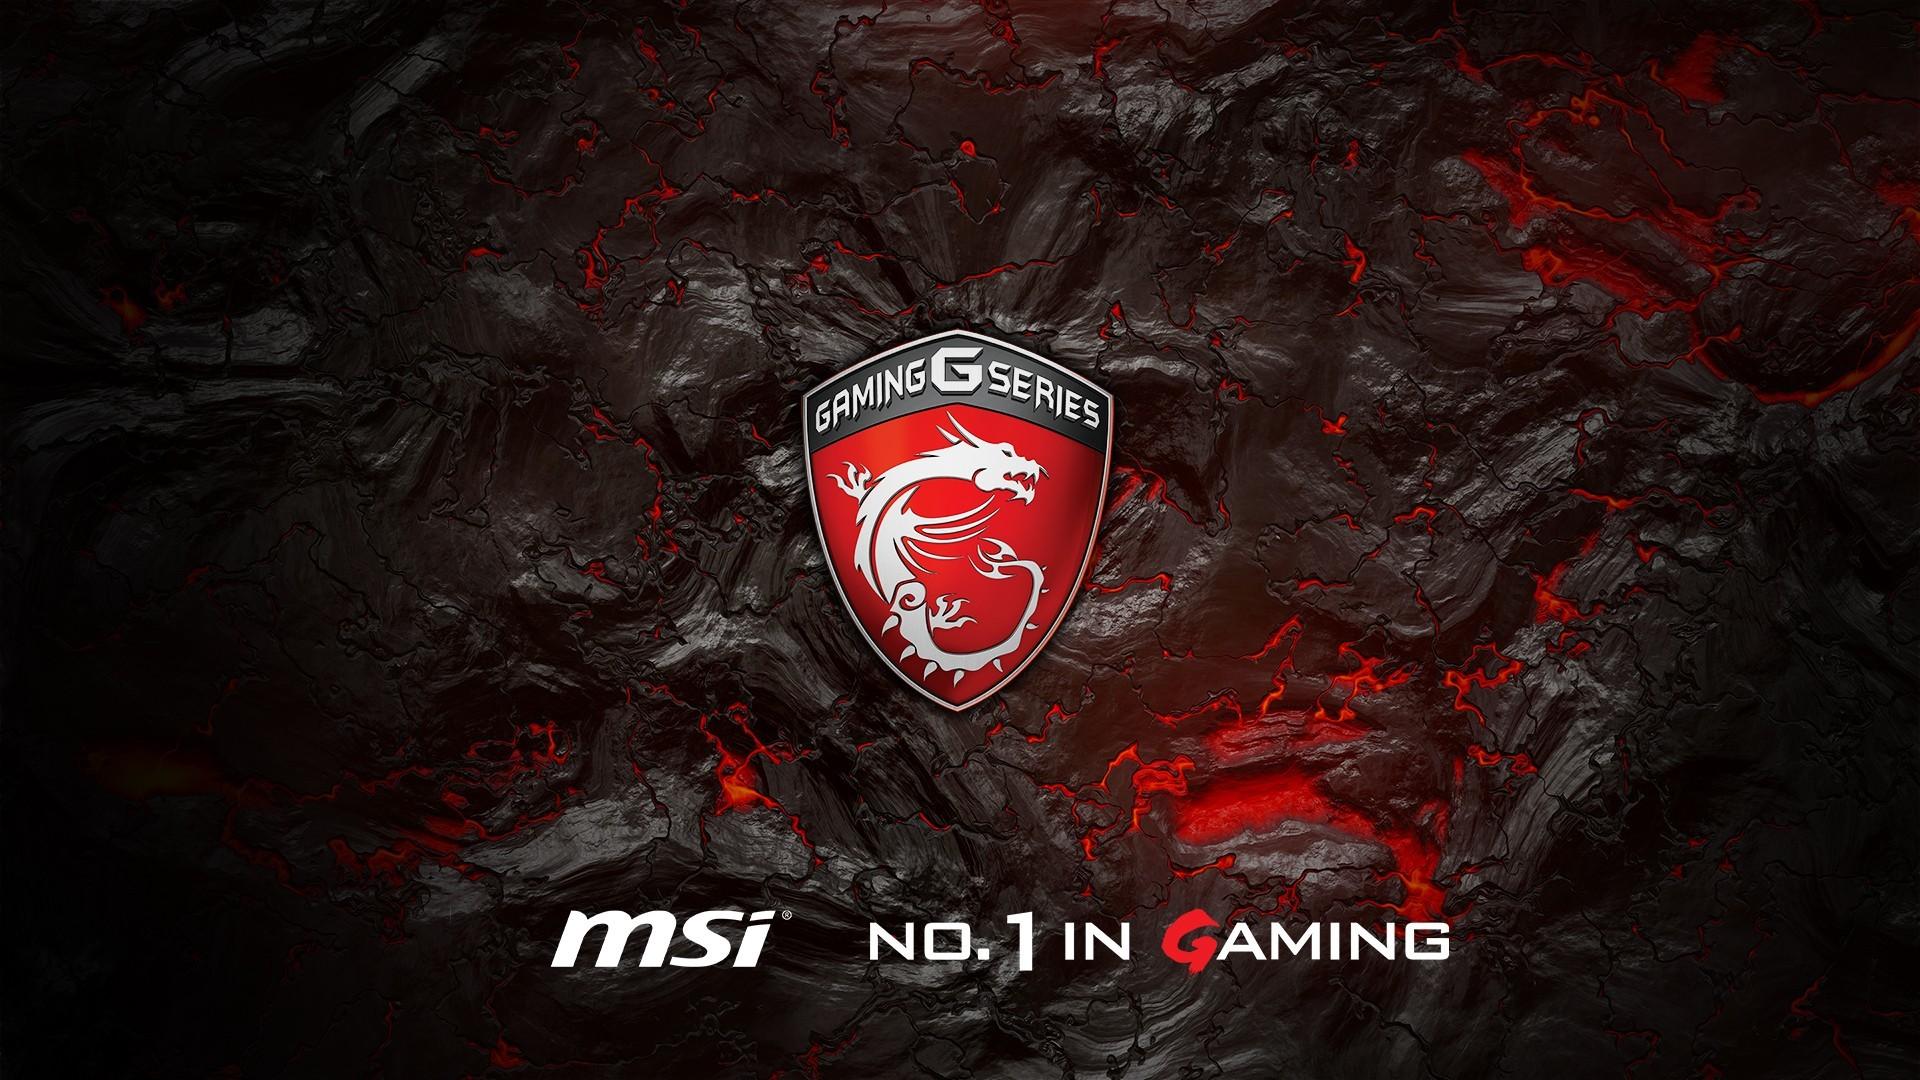 … msi gambit gaming red dragon lava numbers wallpapers hd …